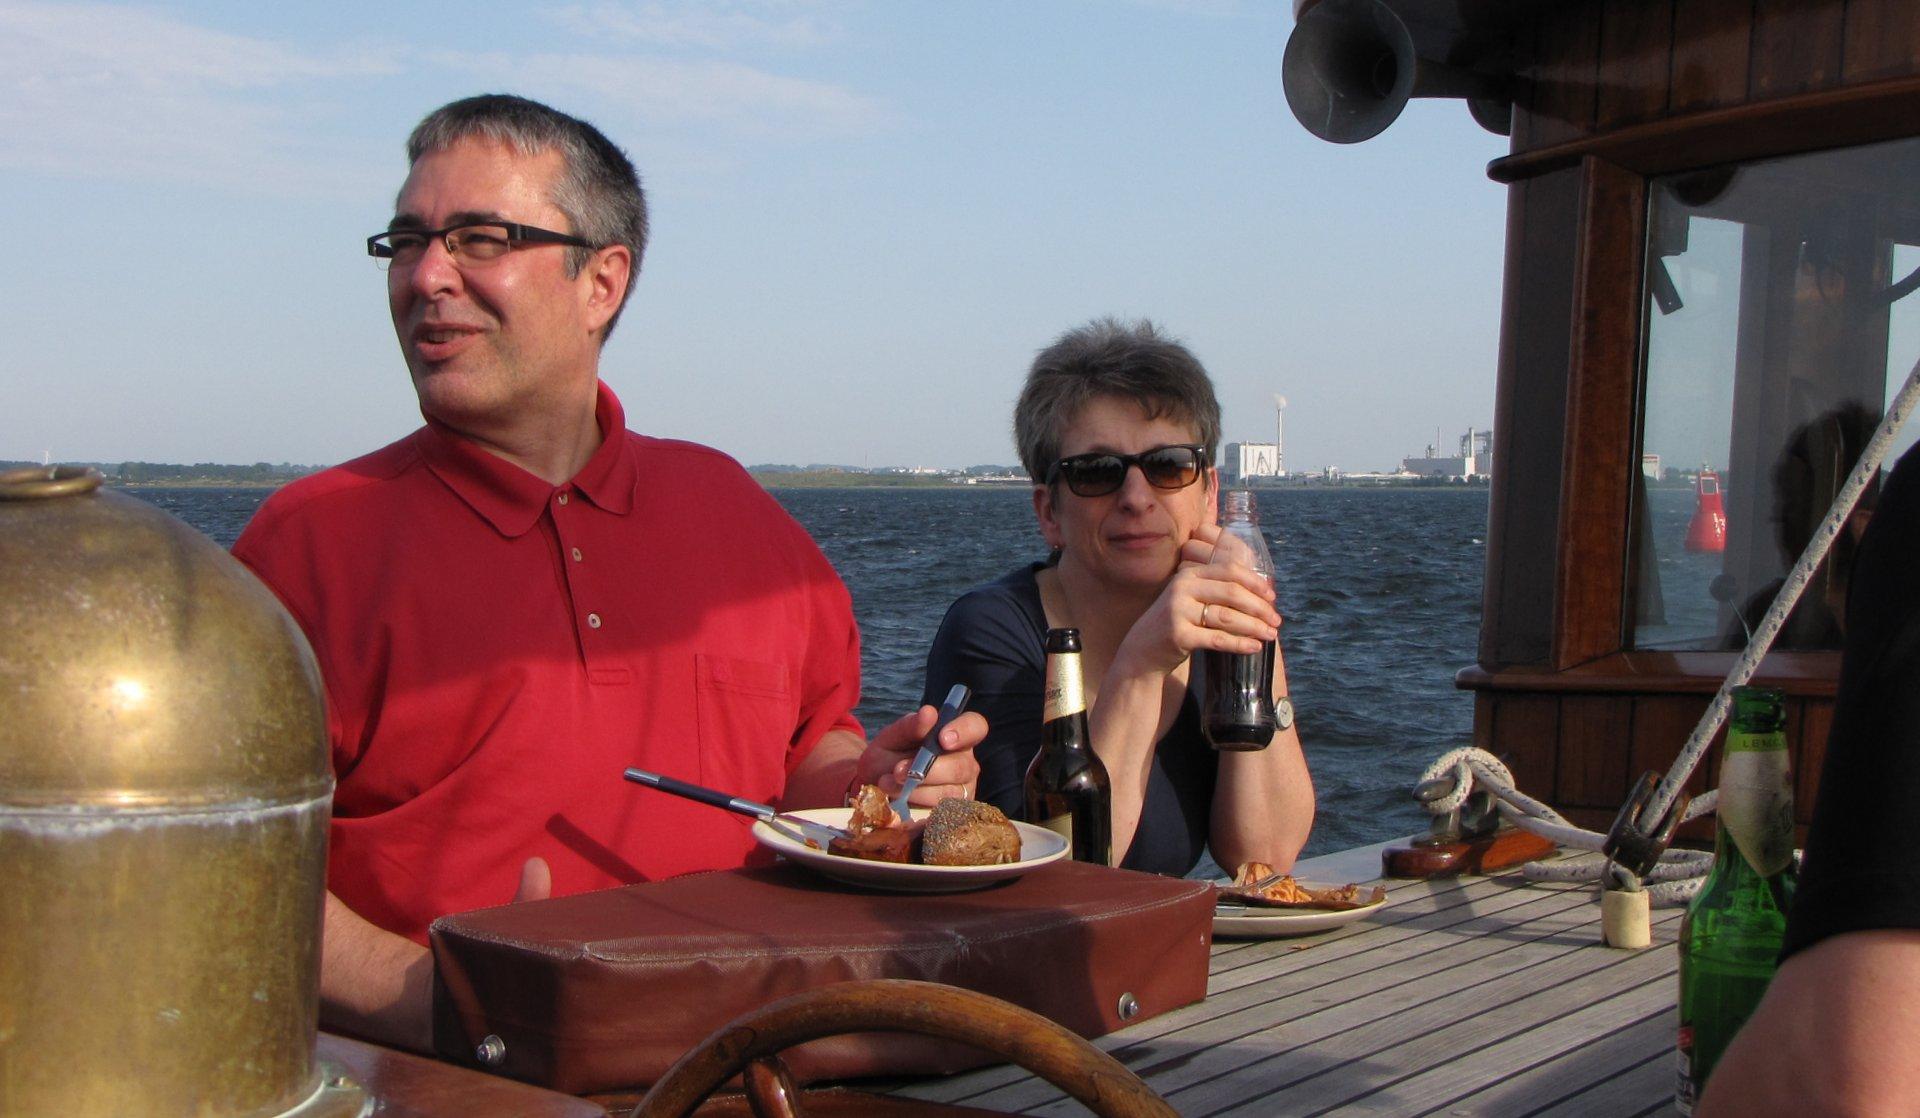 20-2011-08-26_WismarOT_64